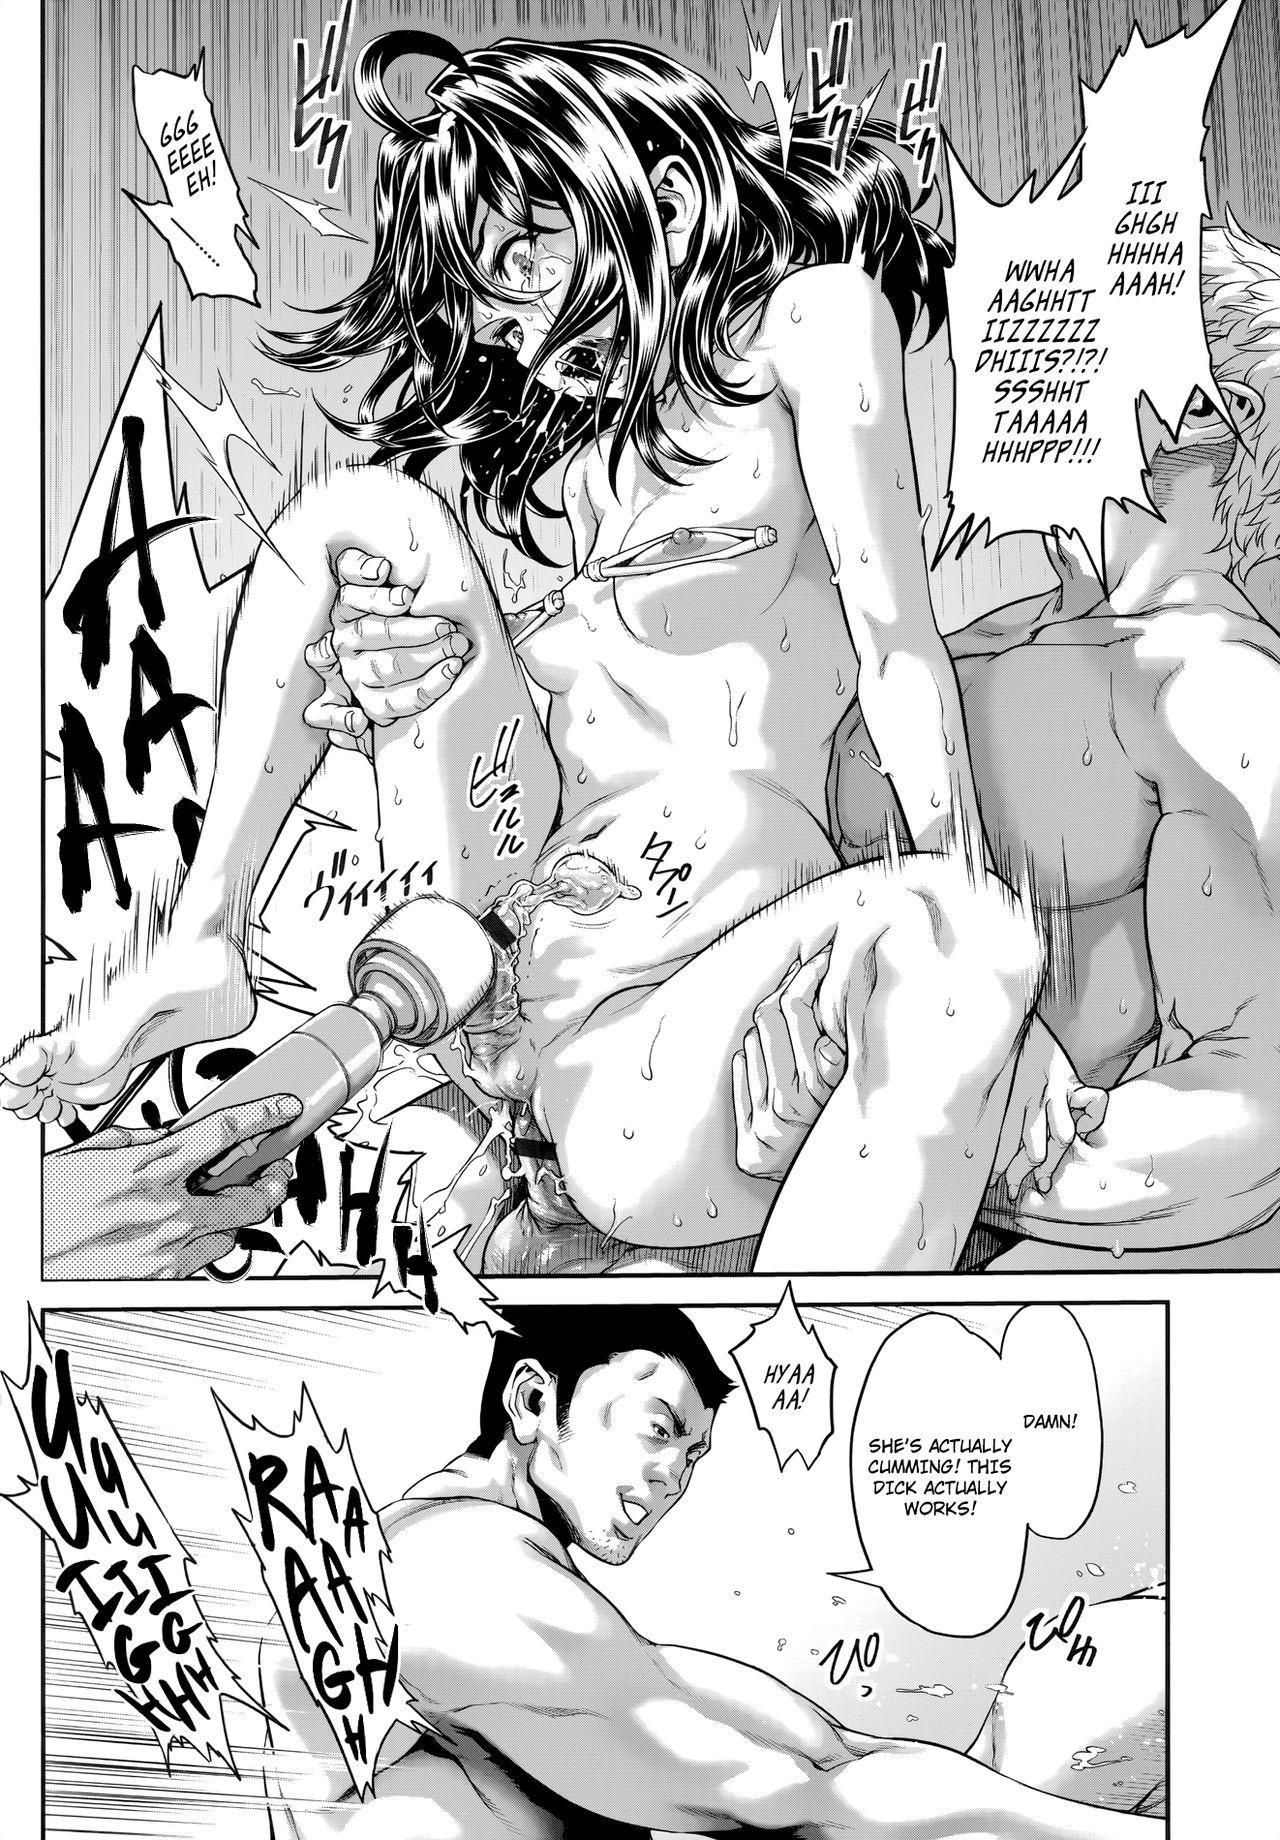 [Sannyuutei Shinta] Chinpotsuki Ijimerarekko | «Dickgirl!», The Bullying Story - Ch. 1-4 [English] [34th squad] 89